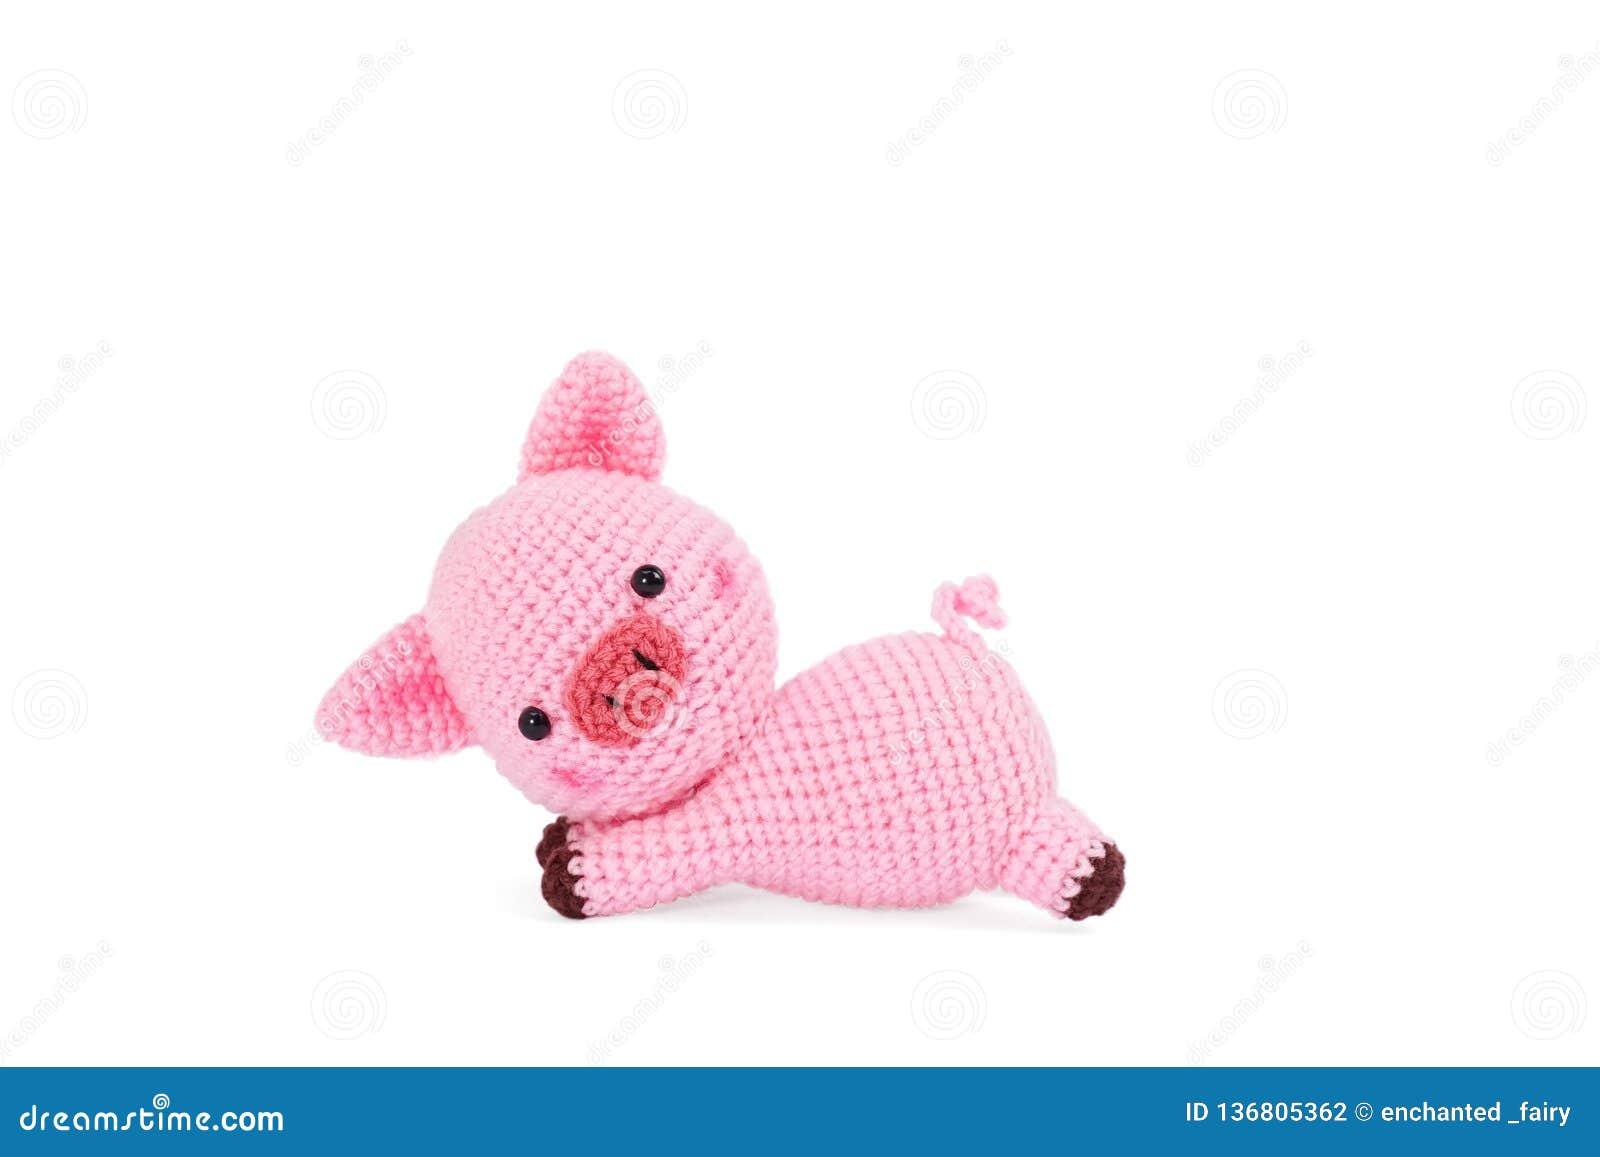 Crochet Animals Little Piggy Amigurumi Tutorial - Part 1 - Craft ... | 1155x1600